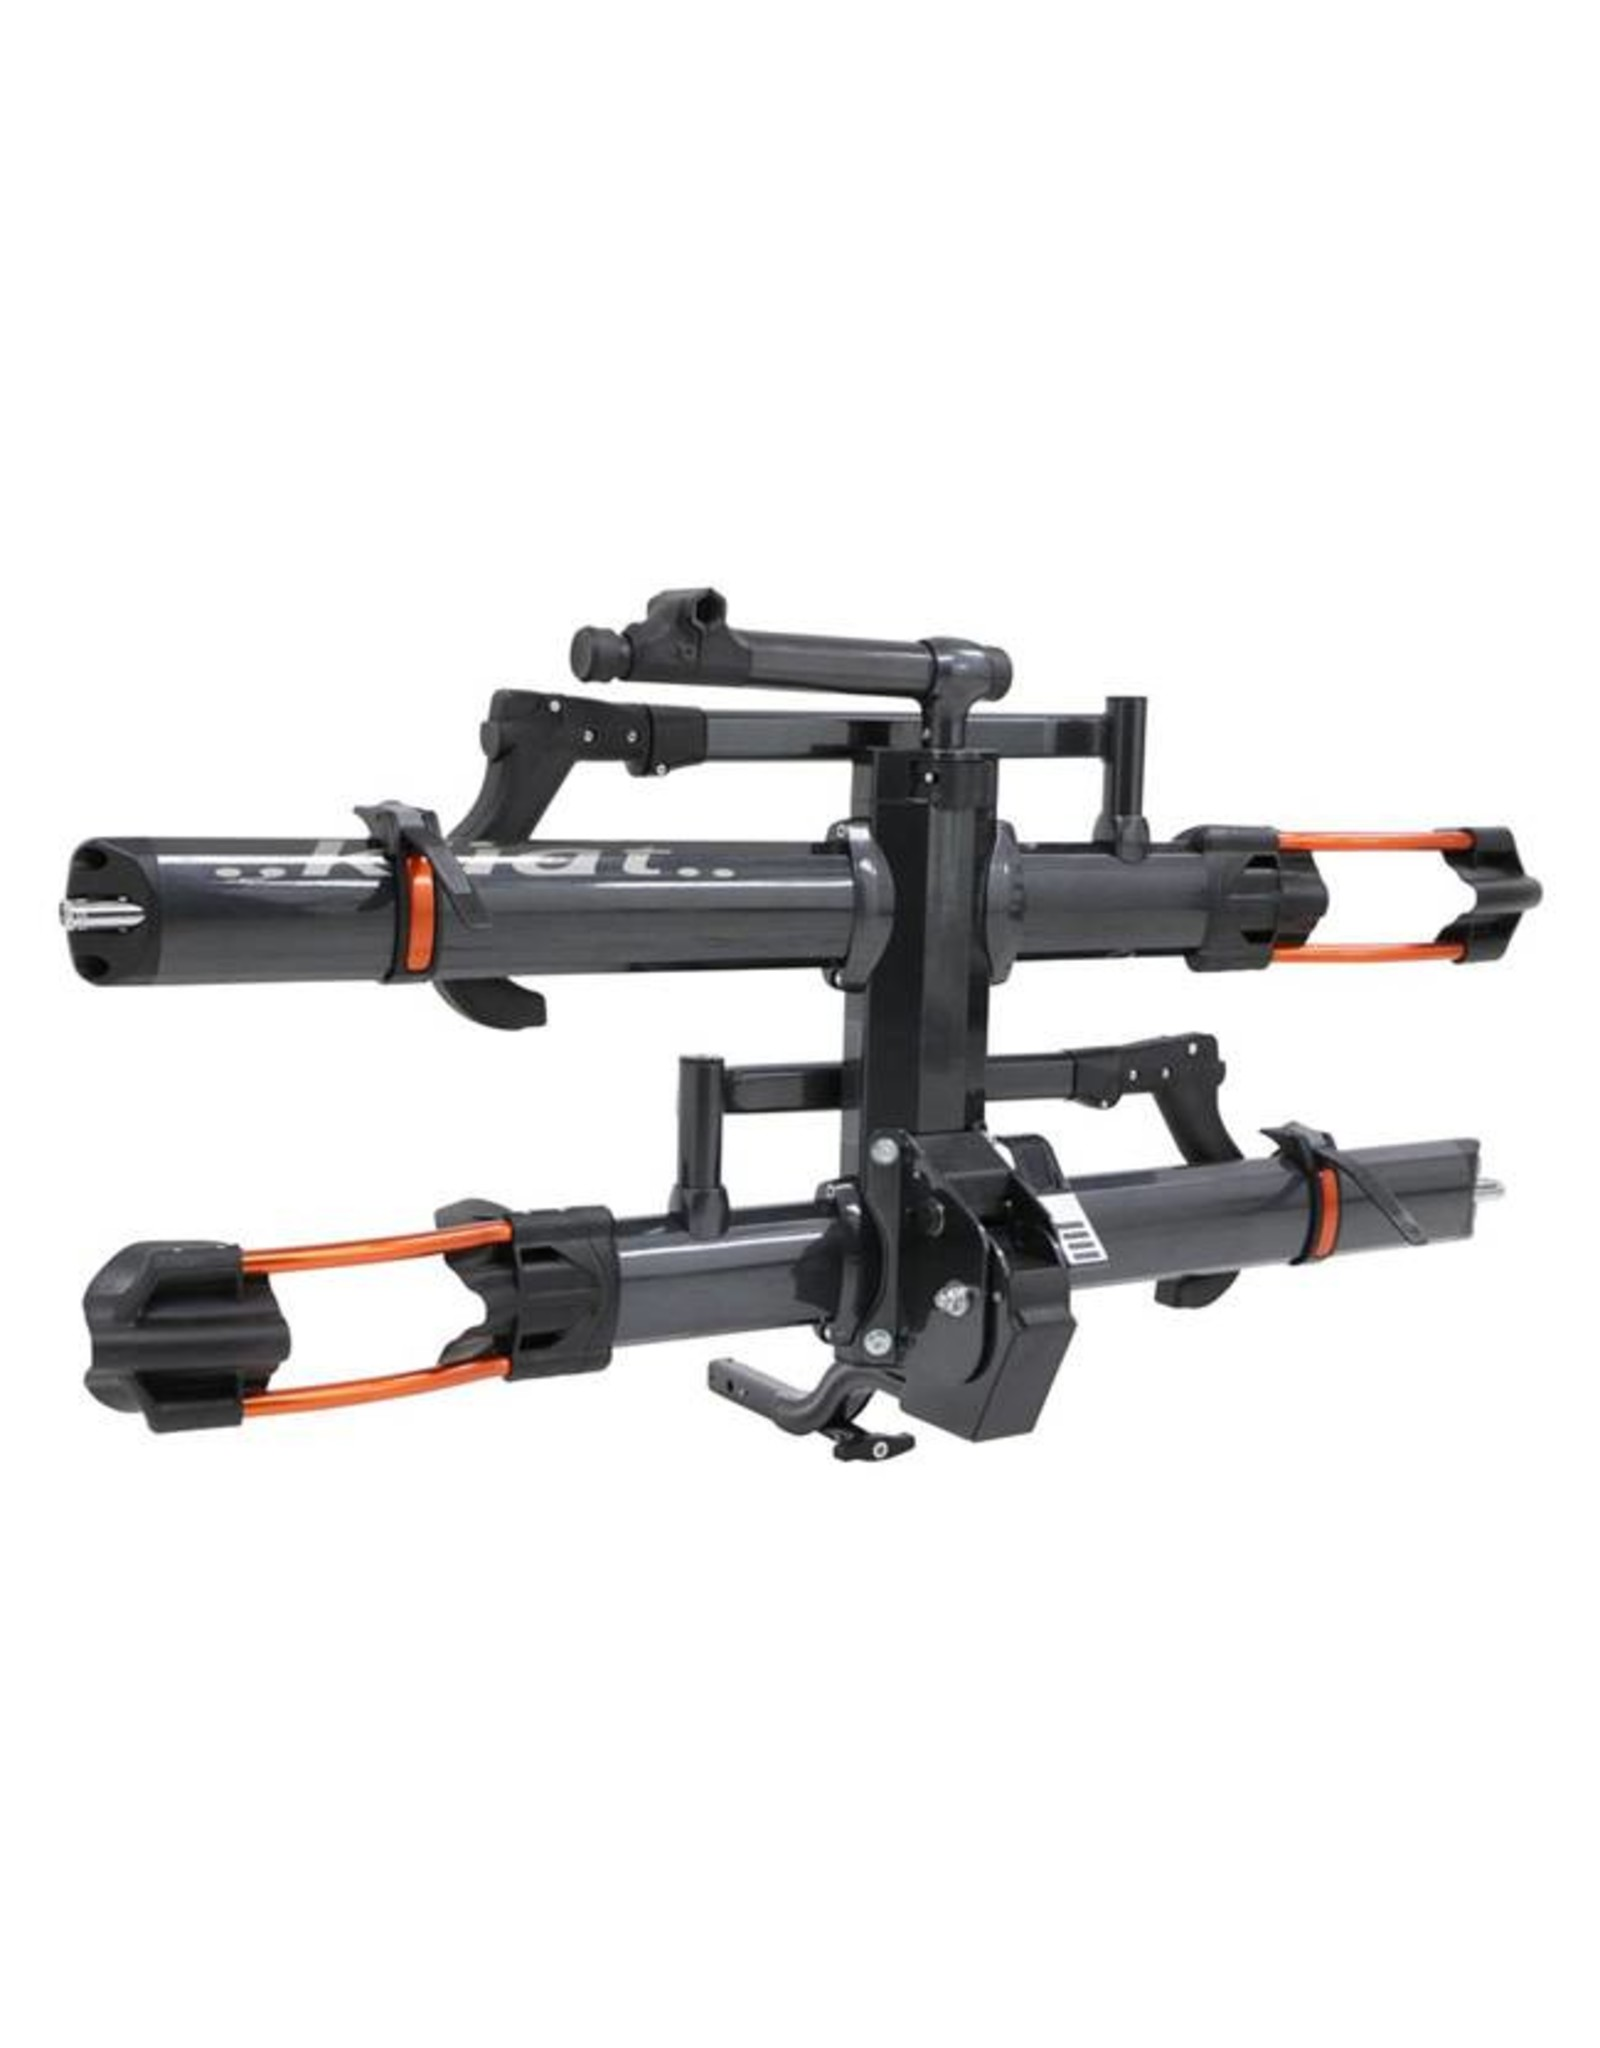 "Kuat Kuat NV 2.0 2-Bike Tray Hitch Rack: Metallic Gray and Orange, 1 1/4"" Receiver"